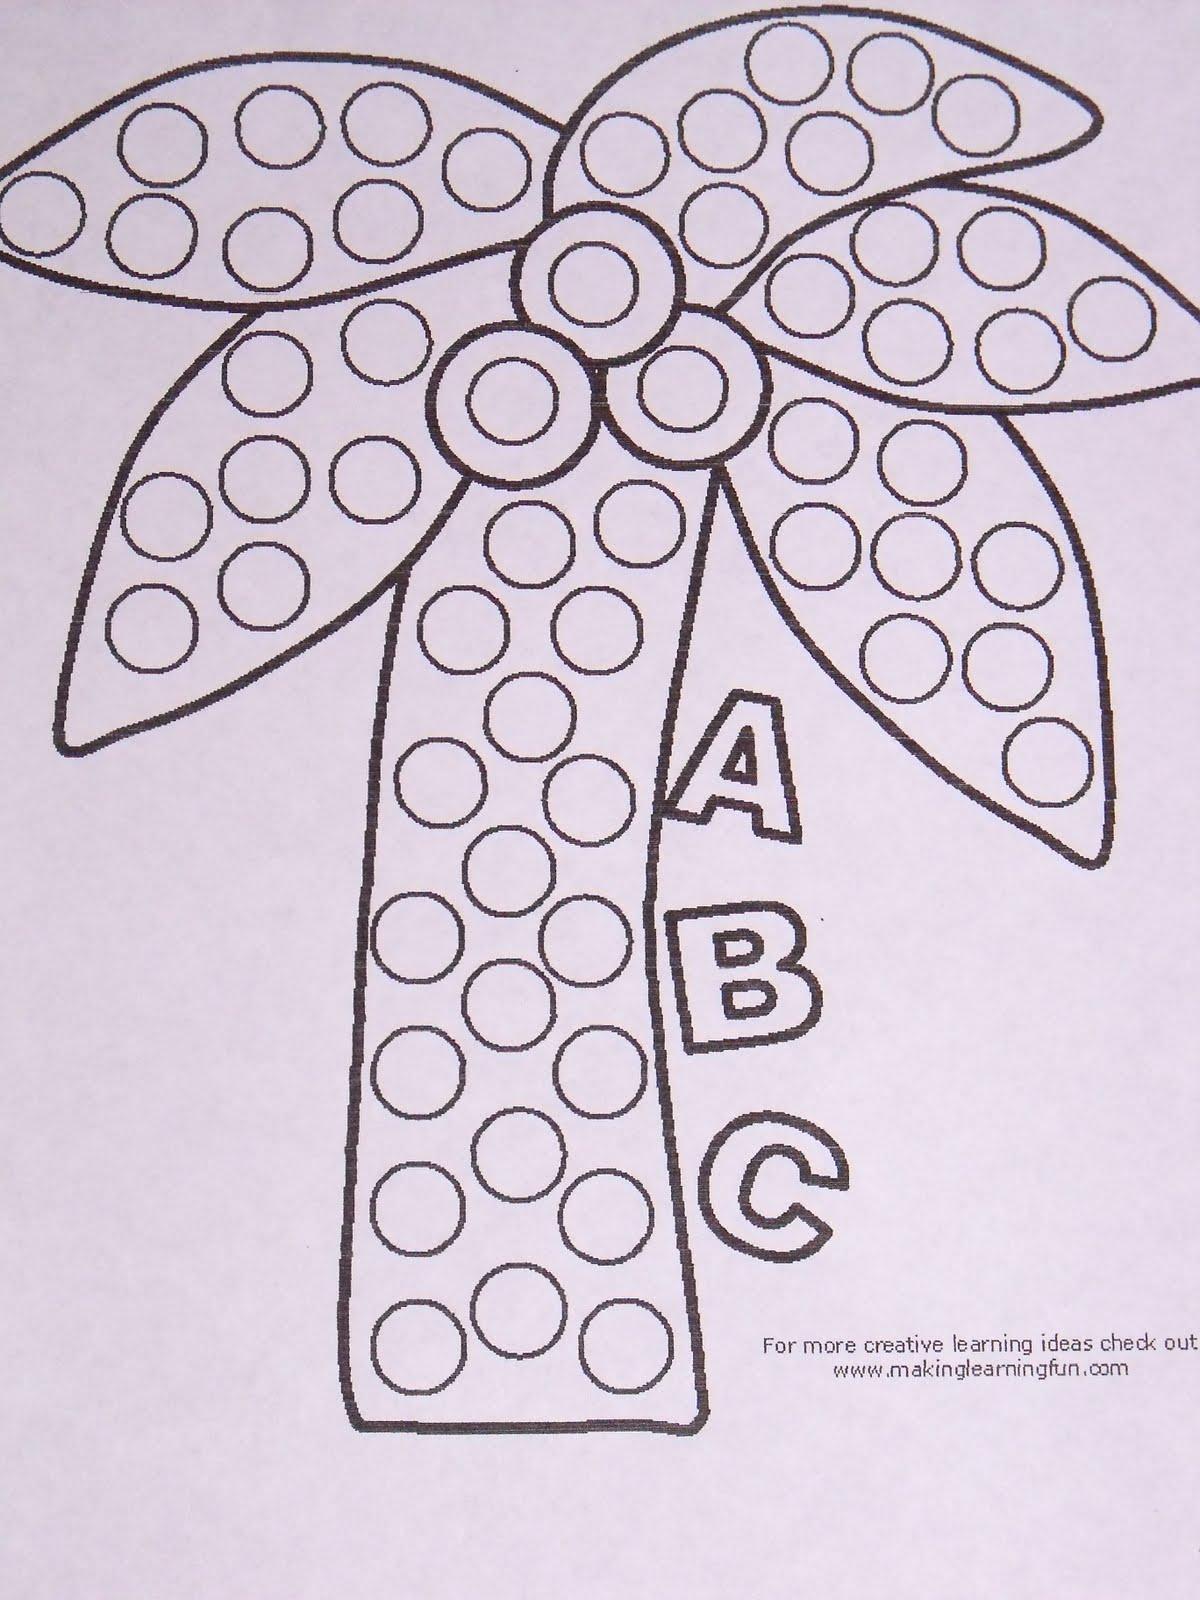 Chicka chicka boom boom tree coloring page